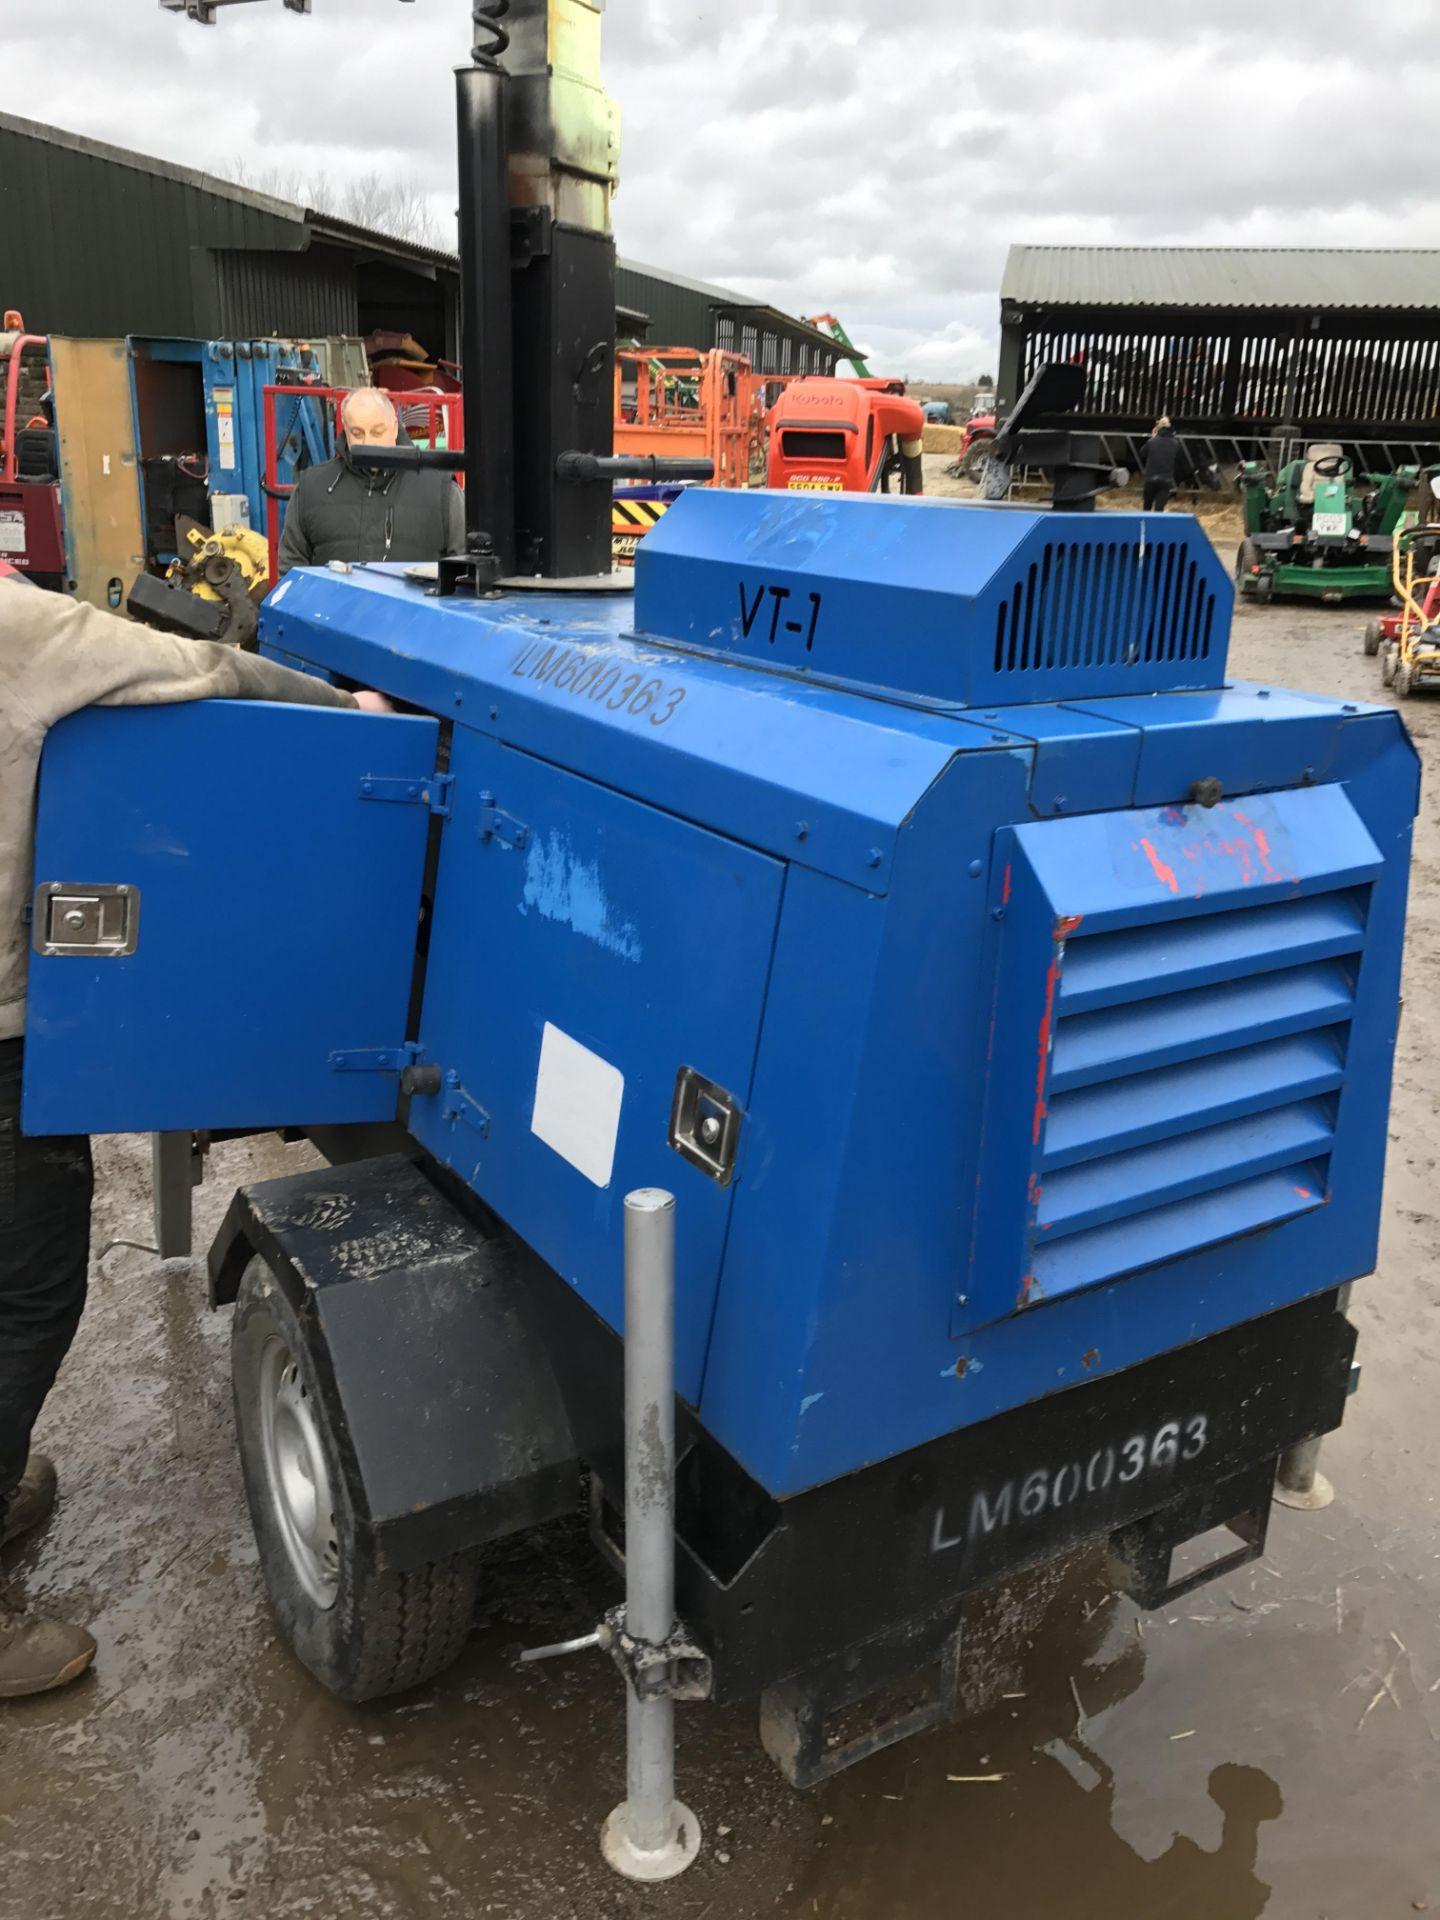 Los 518 - DS - VT1 LIGHTING TOWER / GENERATOR - DIESEL ENGINE DRIVEN *PLUS VAT*  SUPER LIGHT VT 1 STARTS